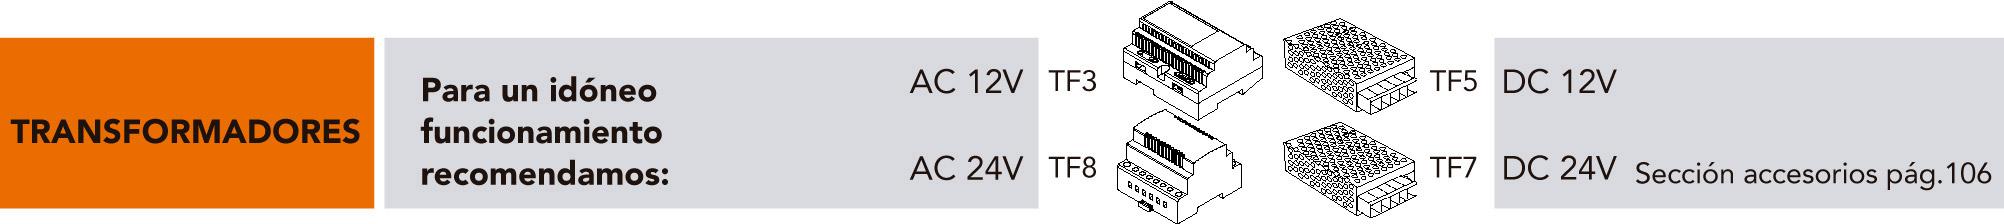 S52_transformadores